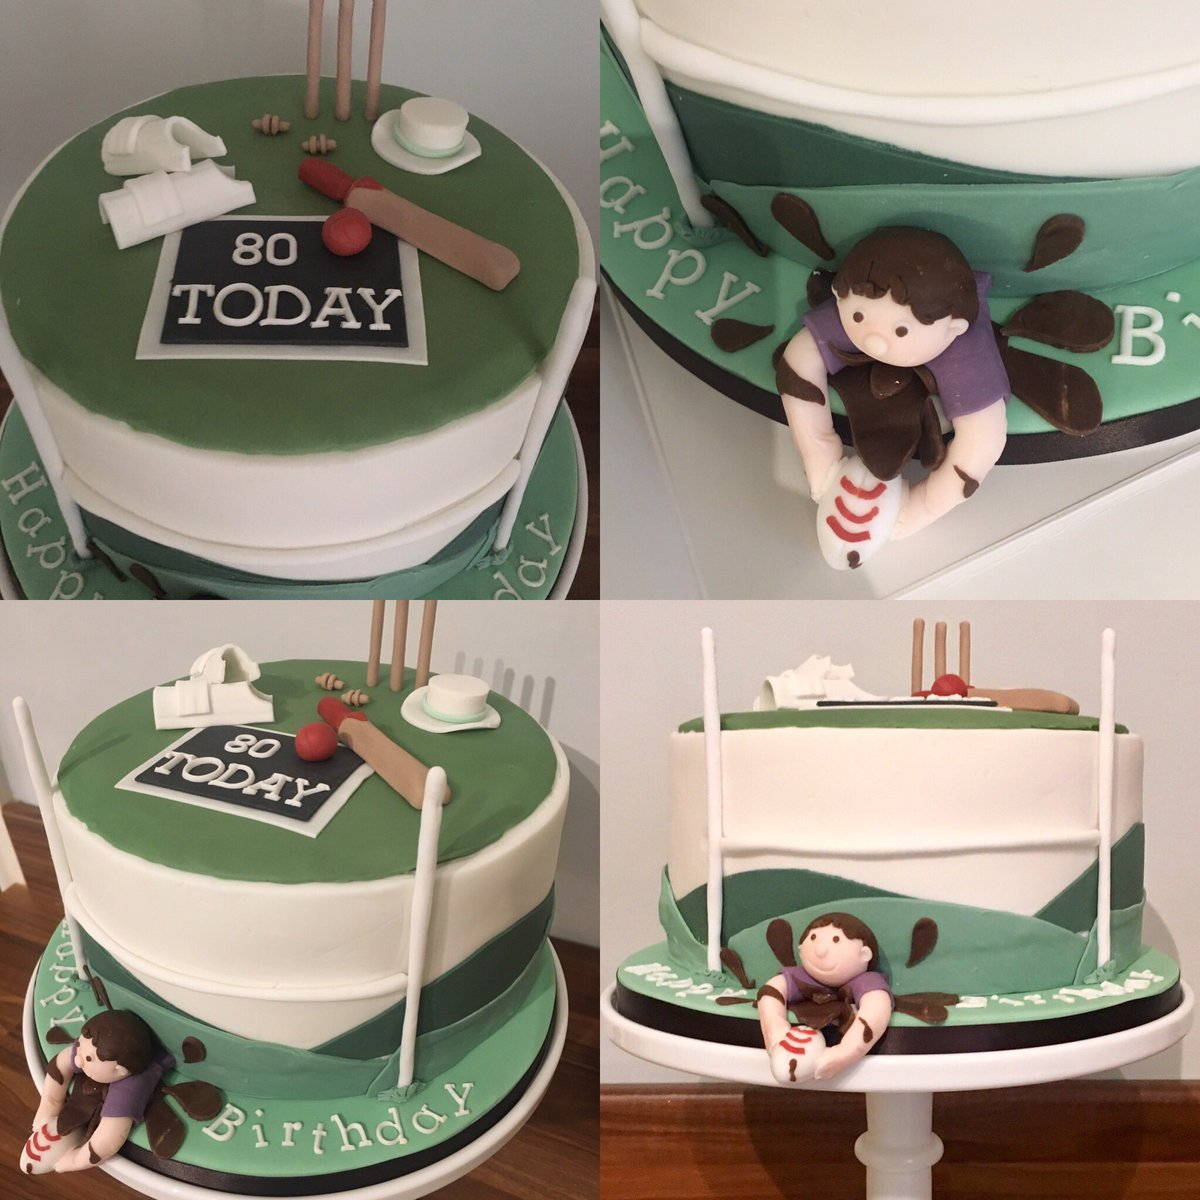 80thbirthdaycake Hashtag On Twitter